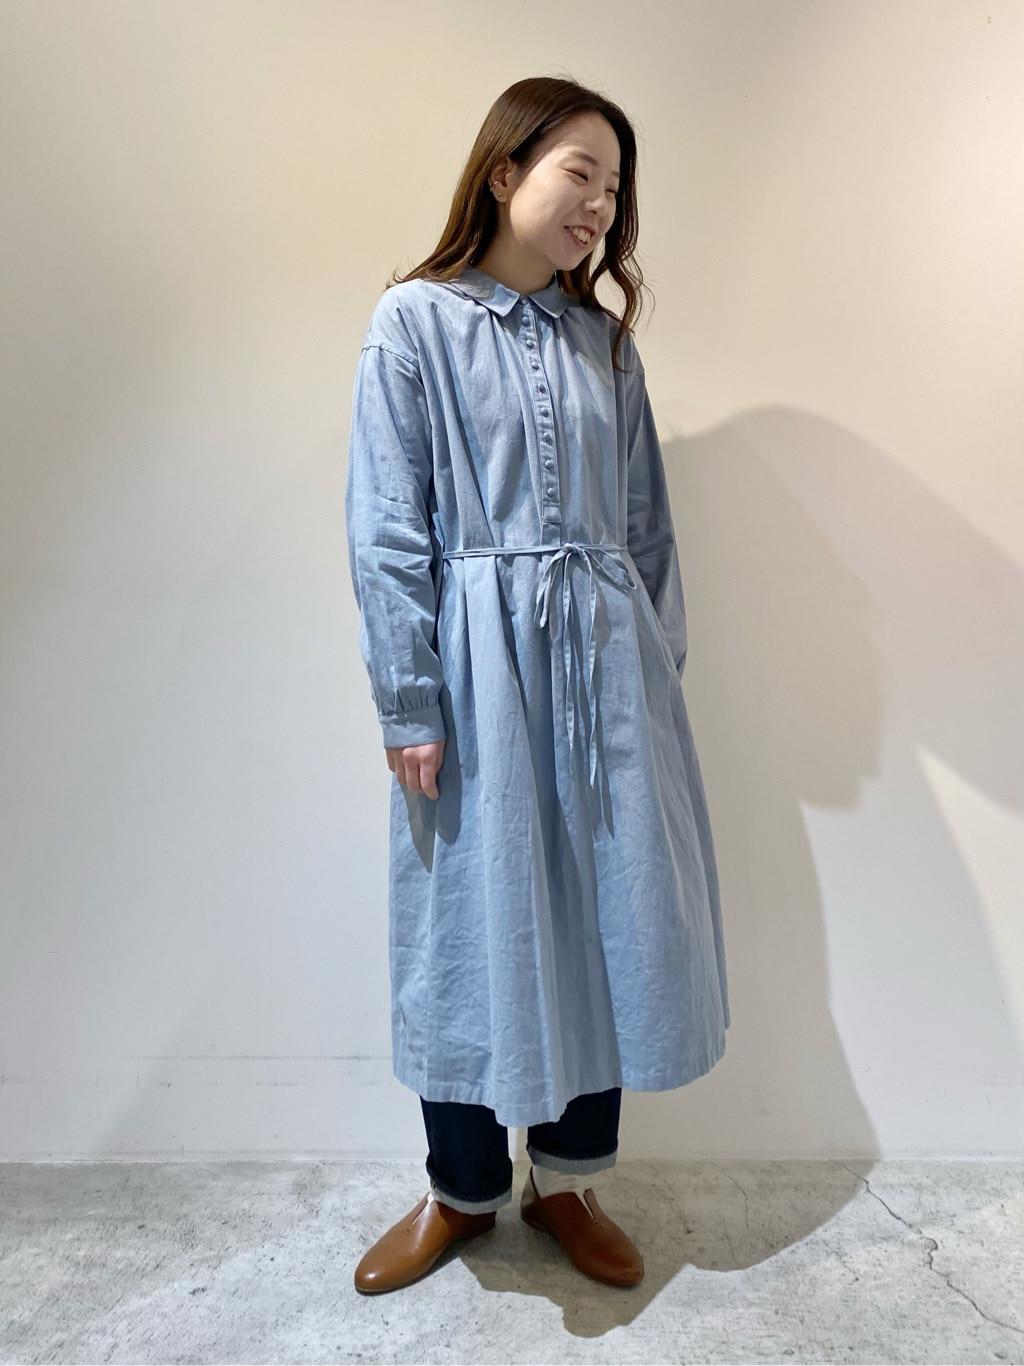 chambre de charme 京都路面 身長:155cm 2020.12.16